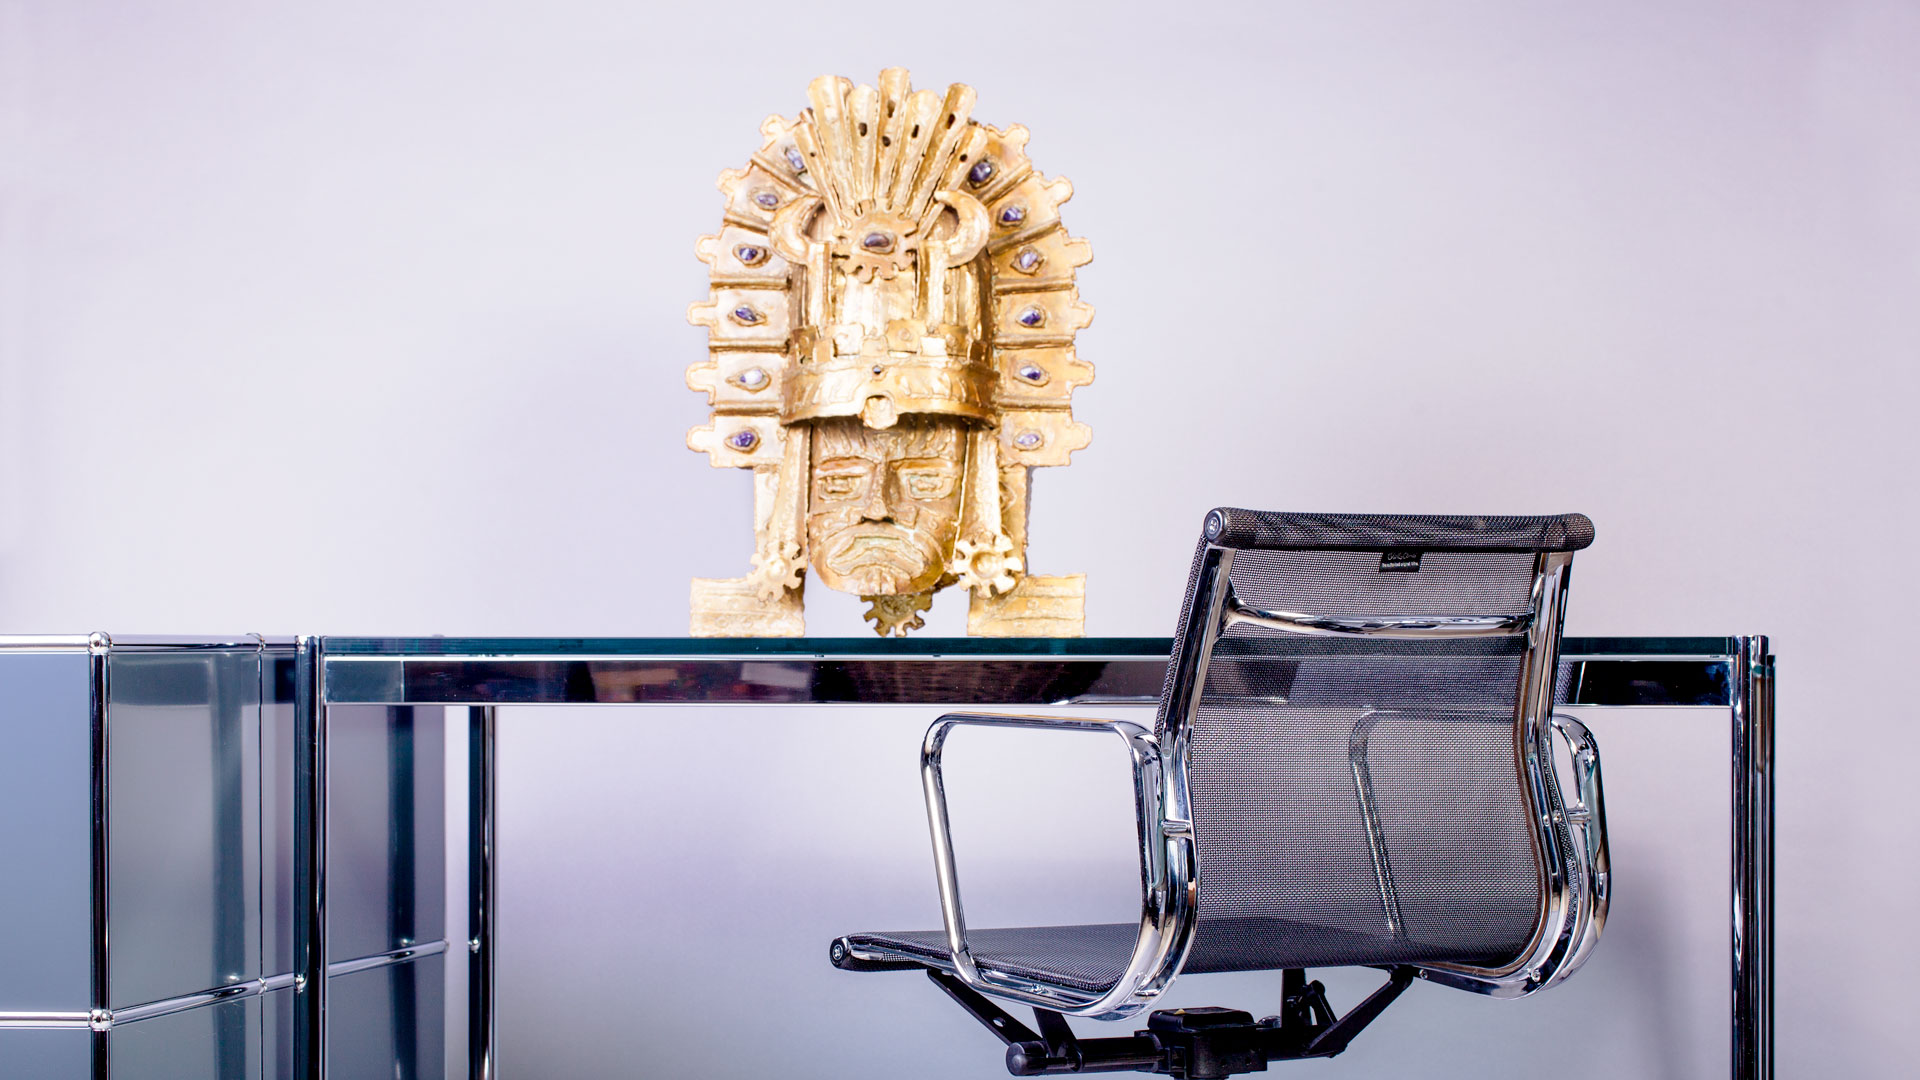 Bennets - Designklassiker - Ankauf von USM, Vitra, Cassina, uvm